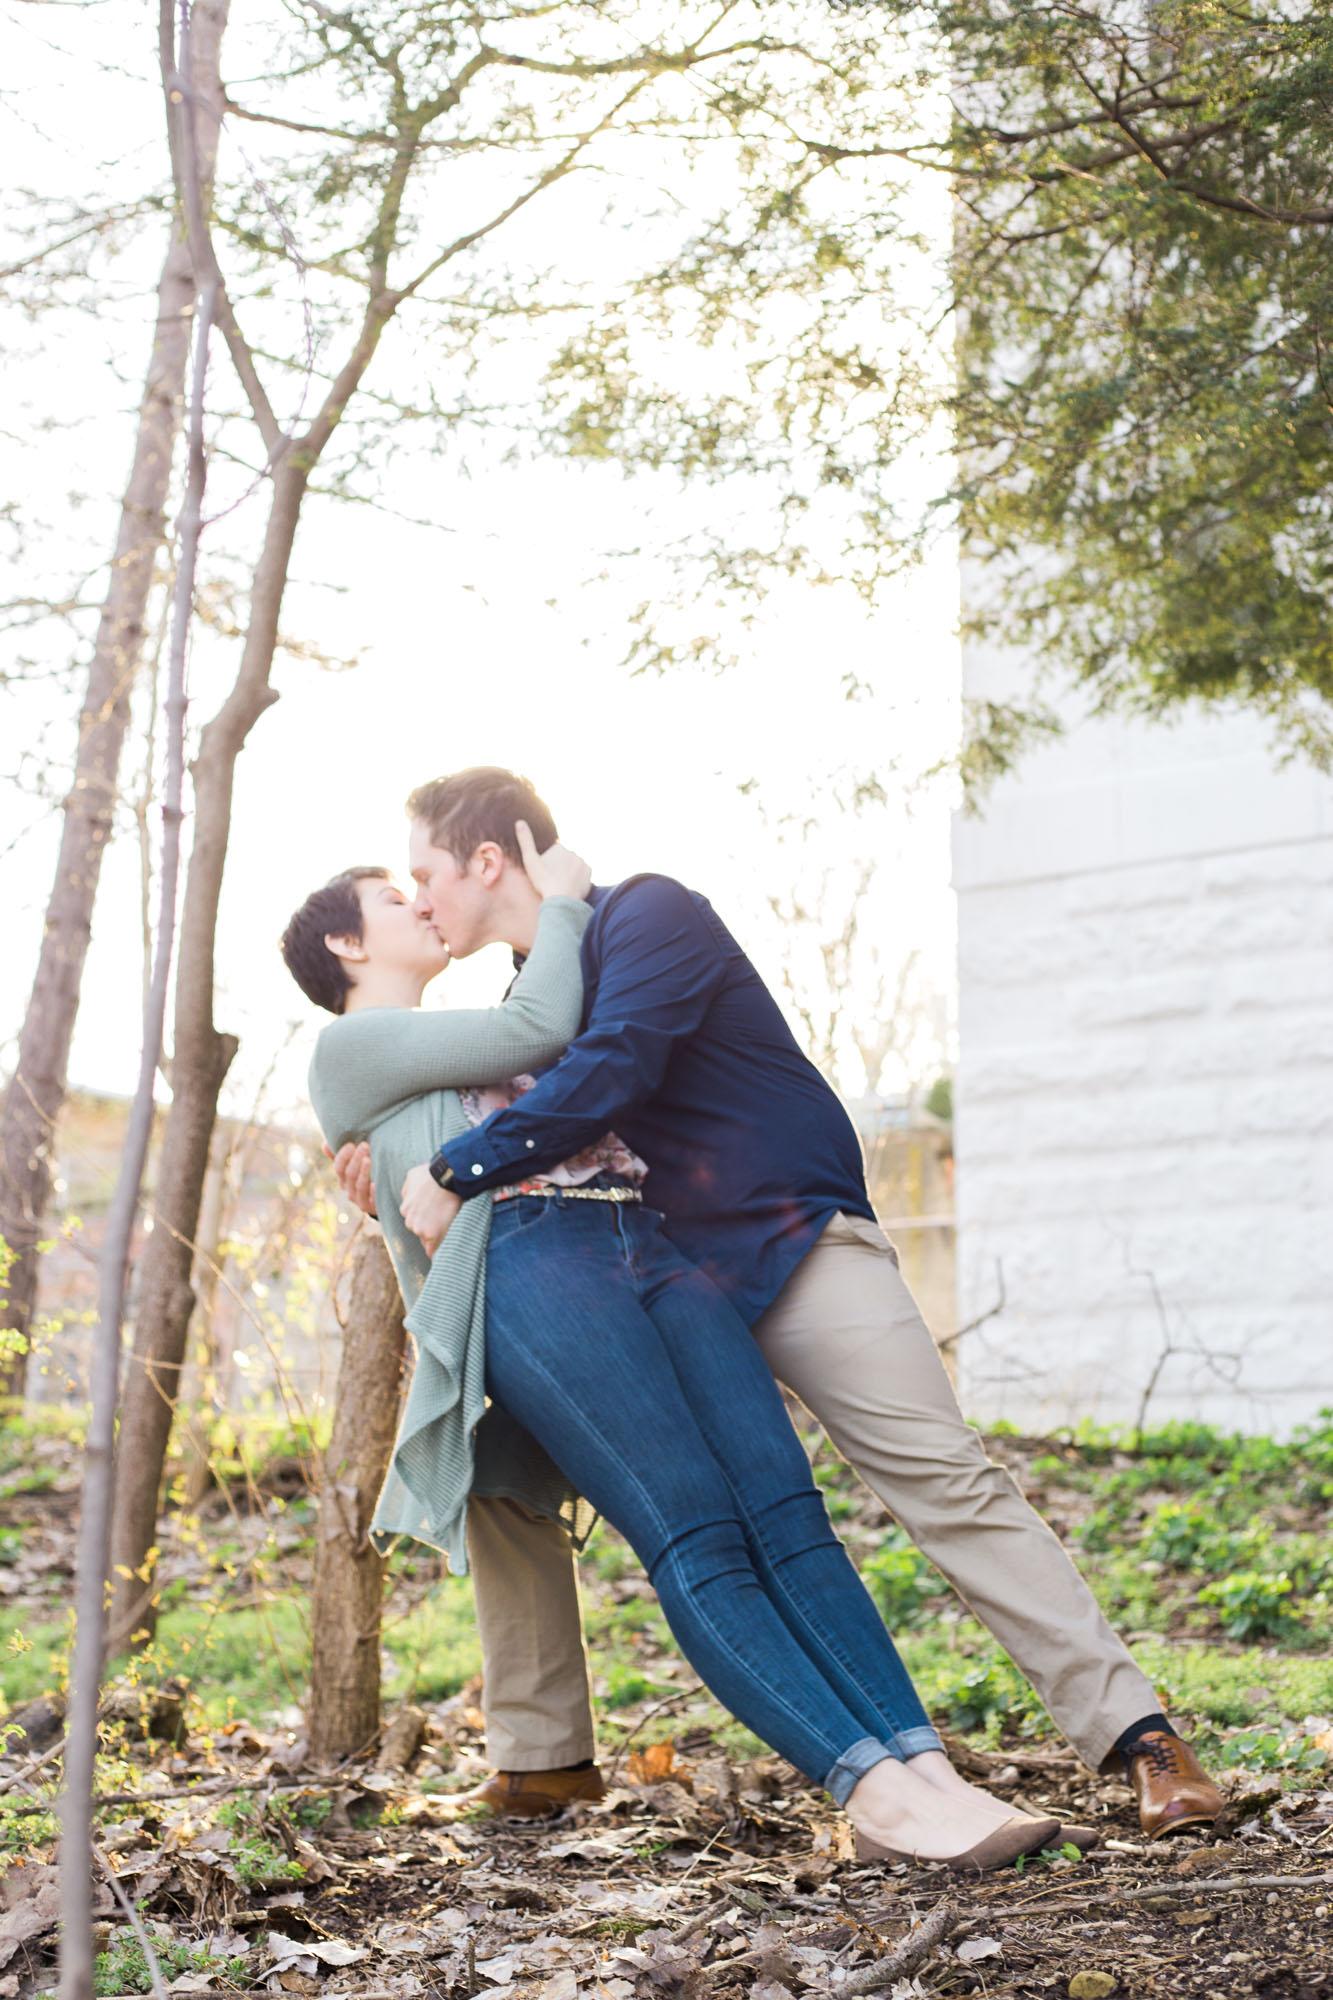 Kent, Ohio Engagement Photos by Cleveland Wedding Photographer Matt Erickson Photography